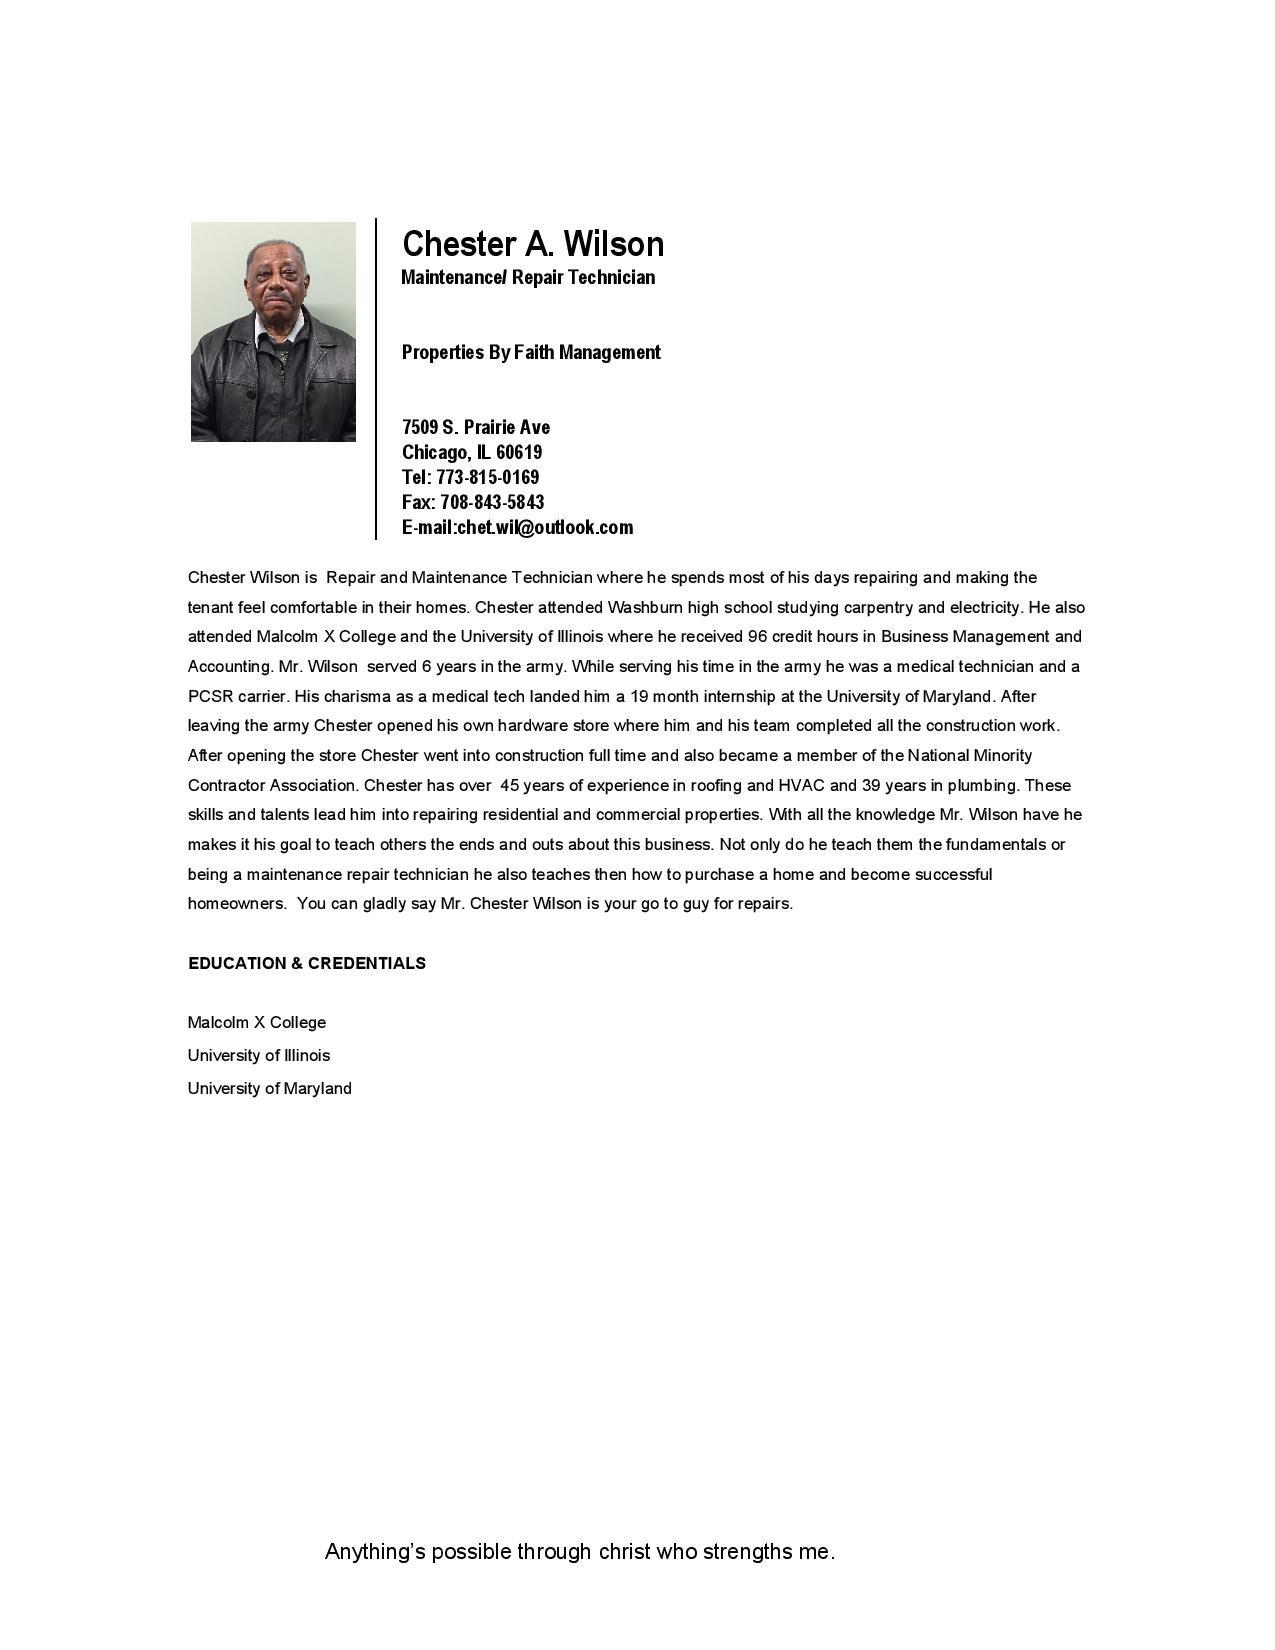 WilsonBio-page-001.jpg